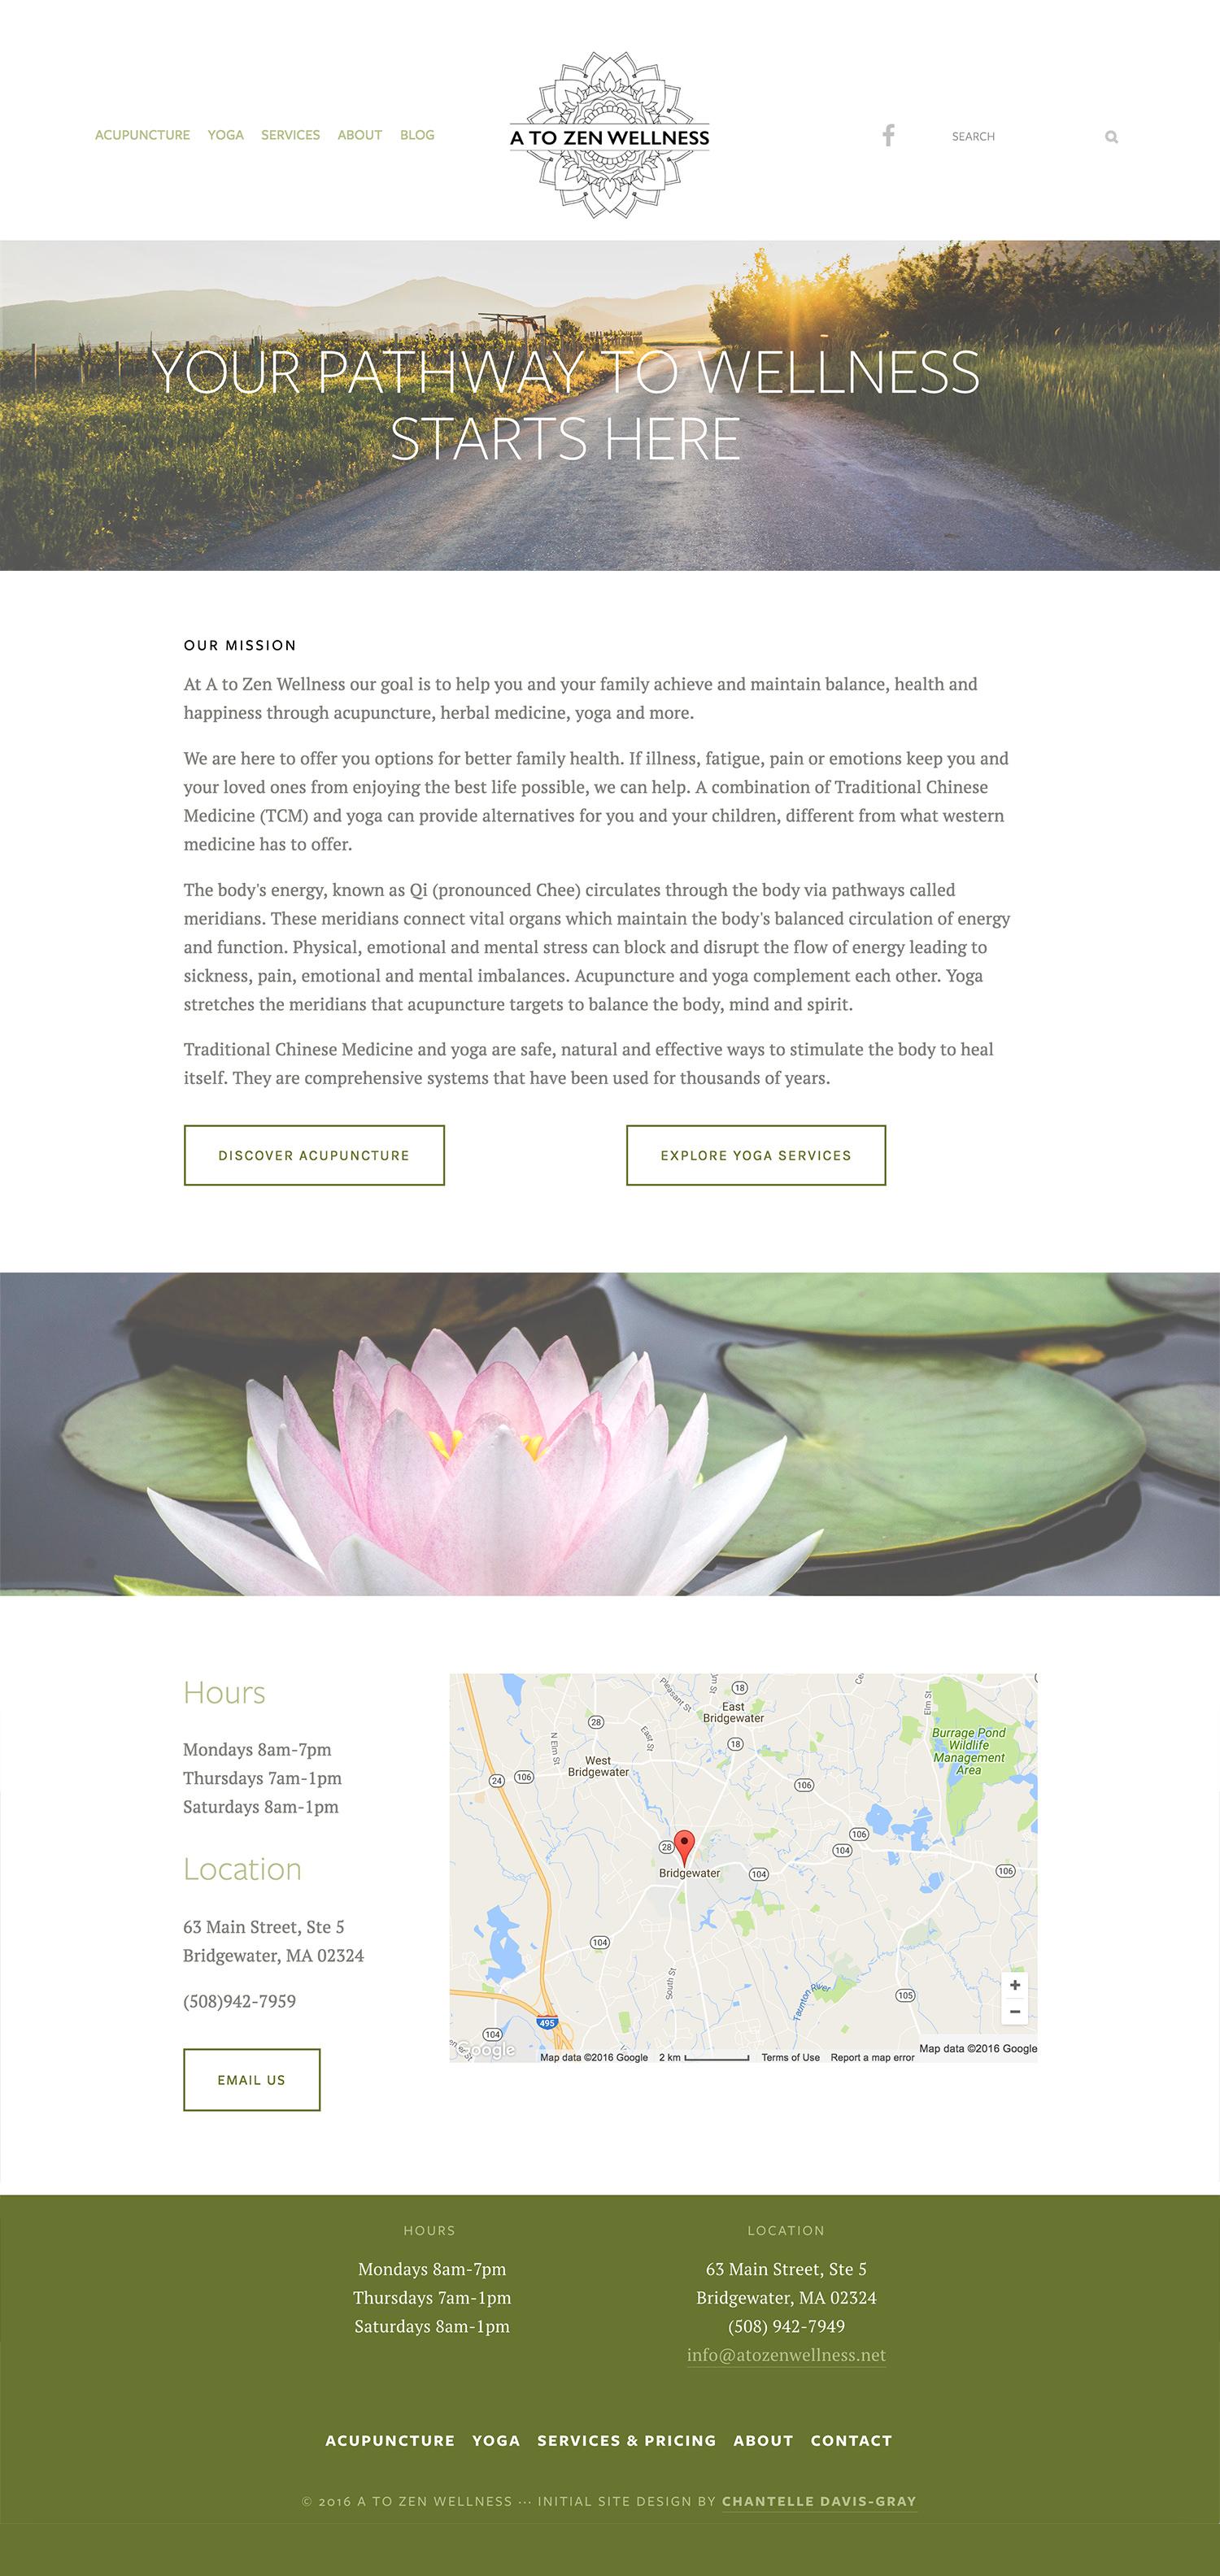 Acupuncture, herbal medicine and yoga Squarespace website design